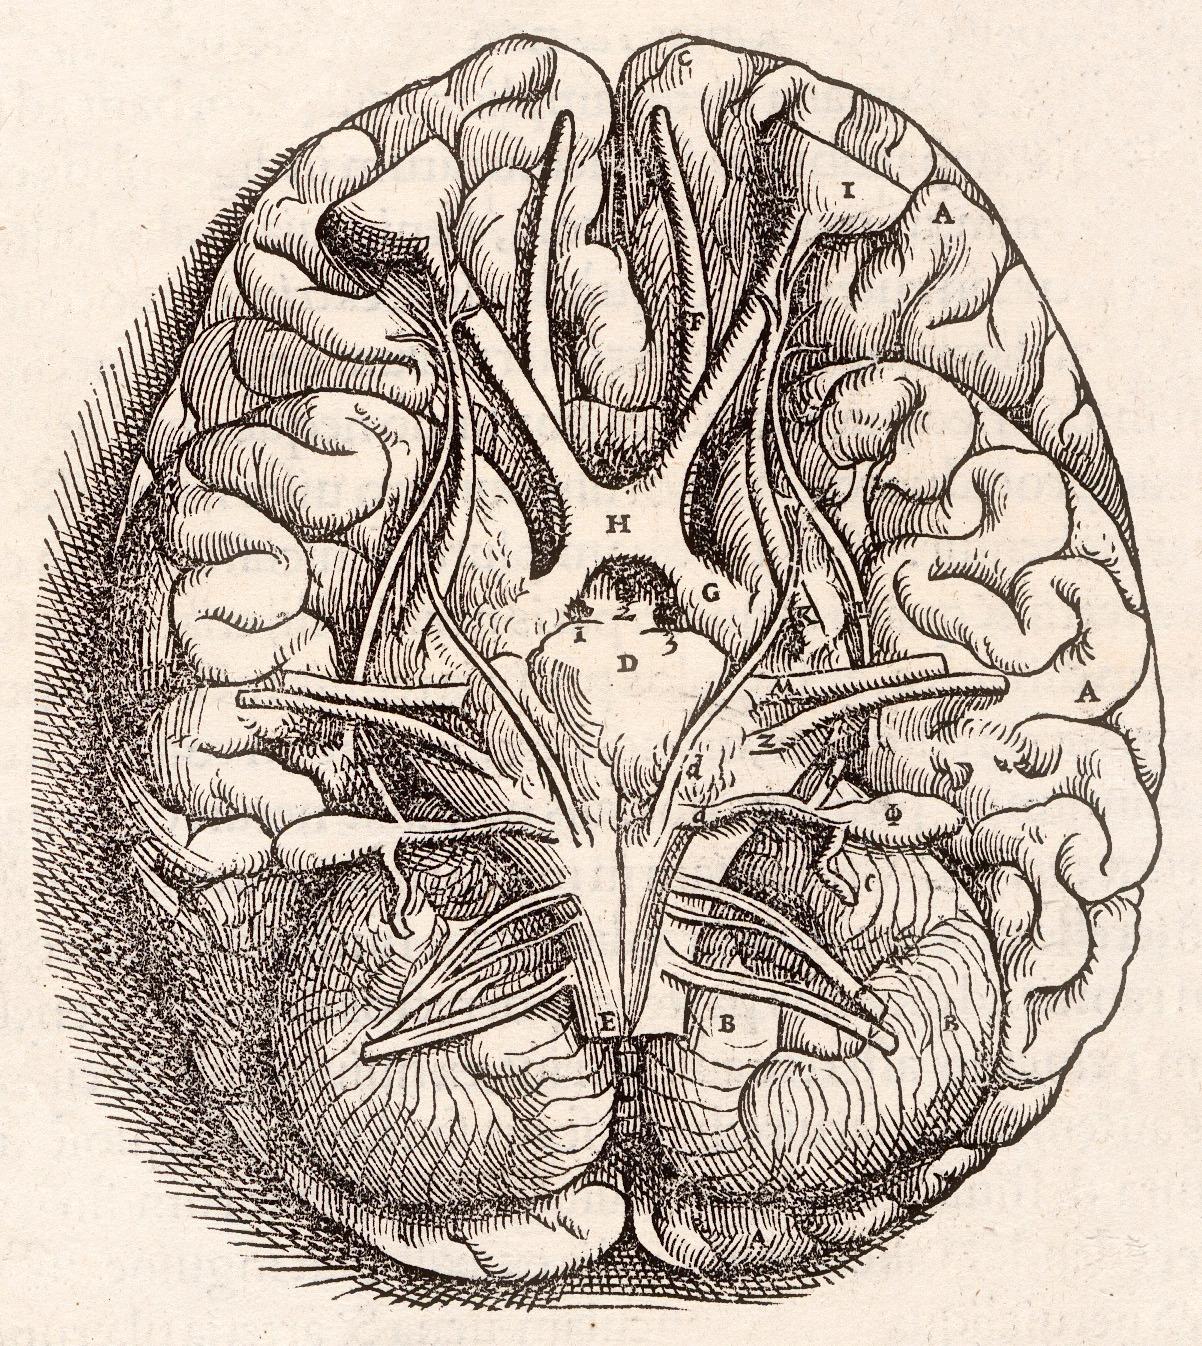 1543, Andreas Vesalius%27 Fabrica, Base Of The Brain.jpg